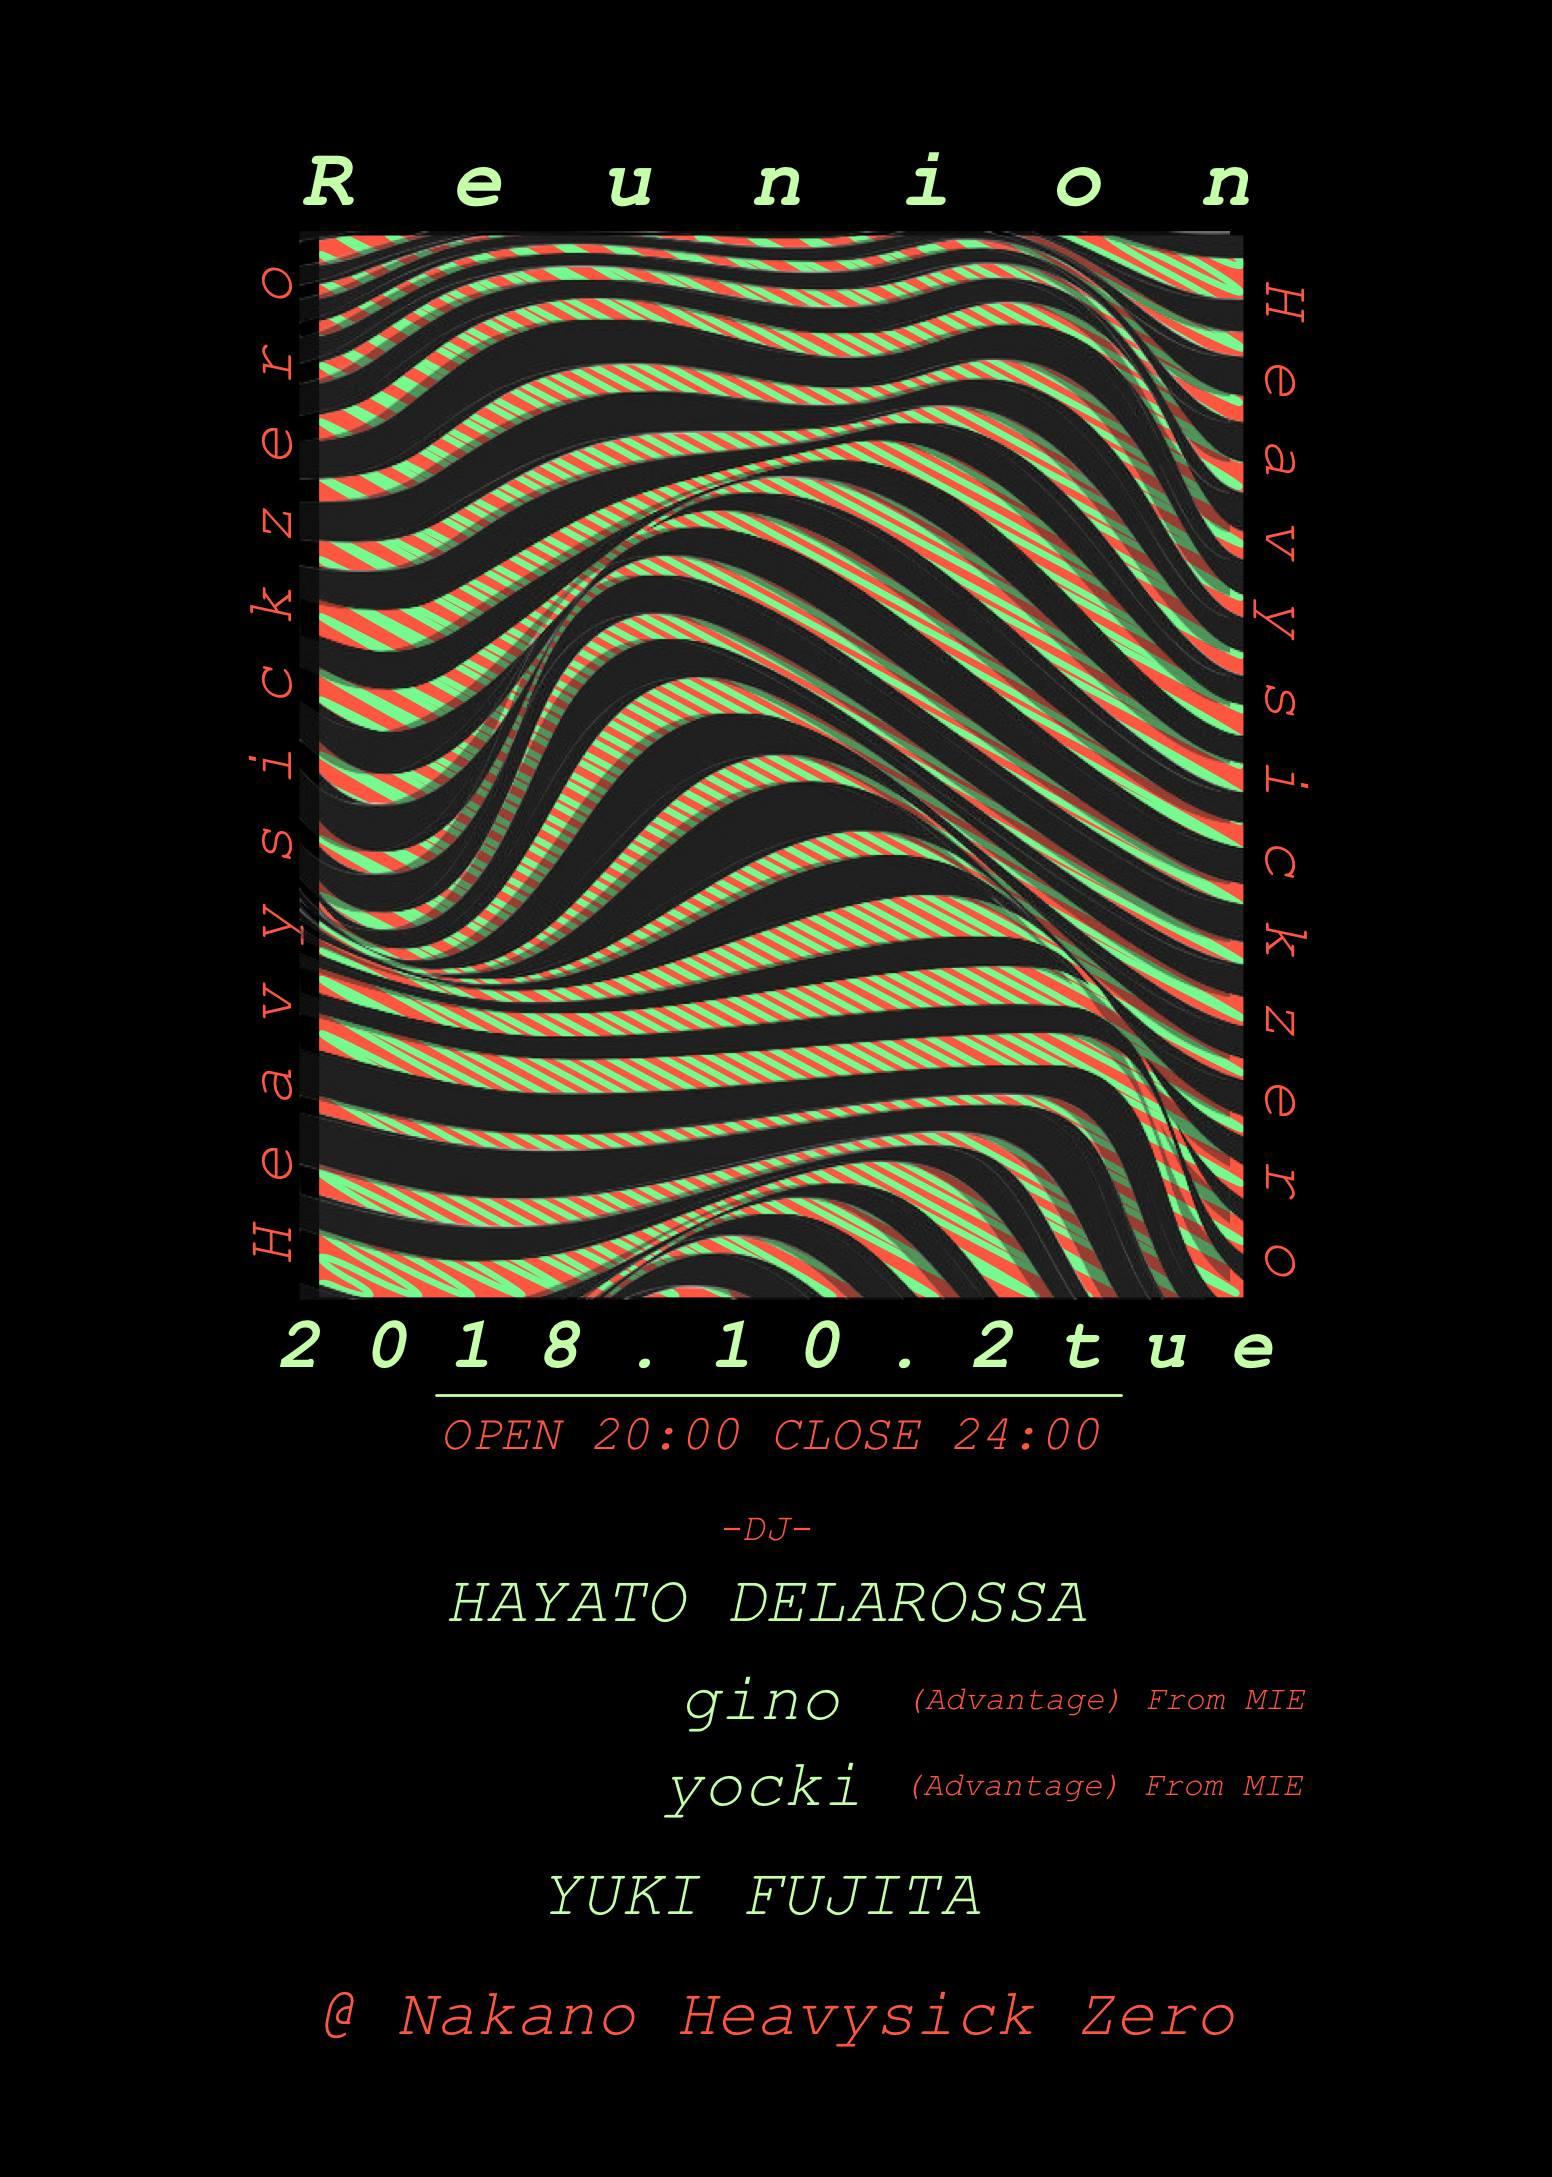 =10/2(火) Reunion=中野heavy sick zero